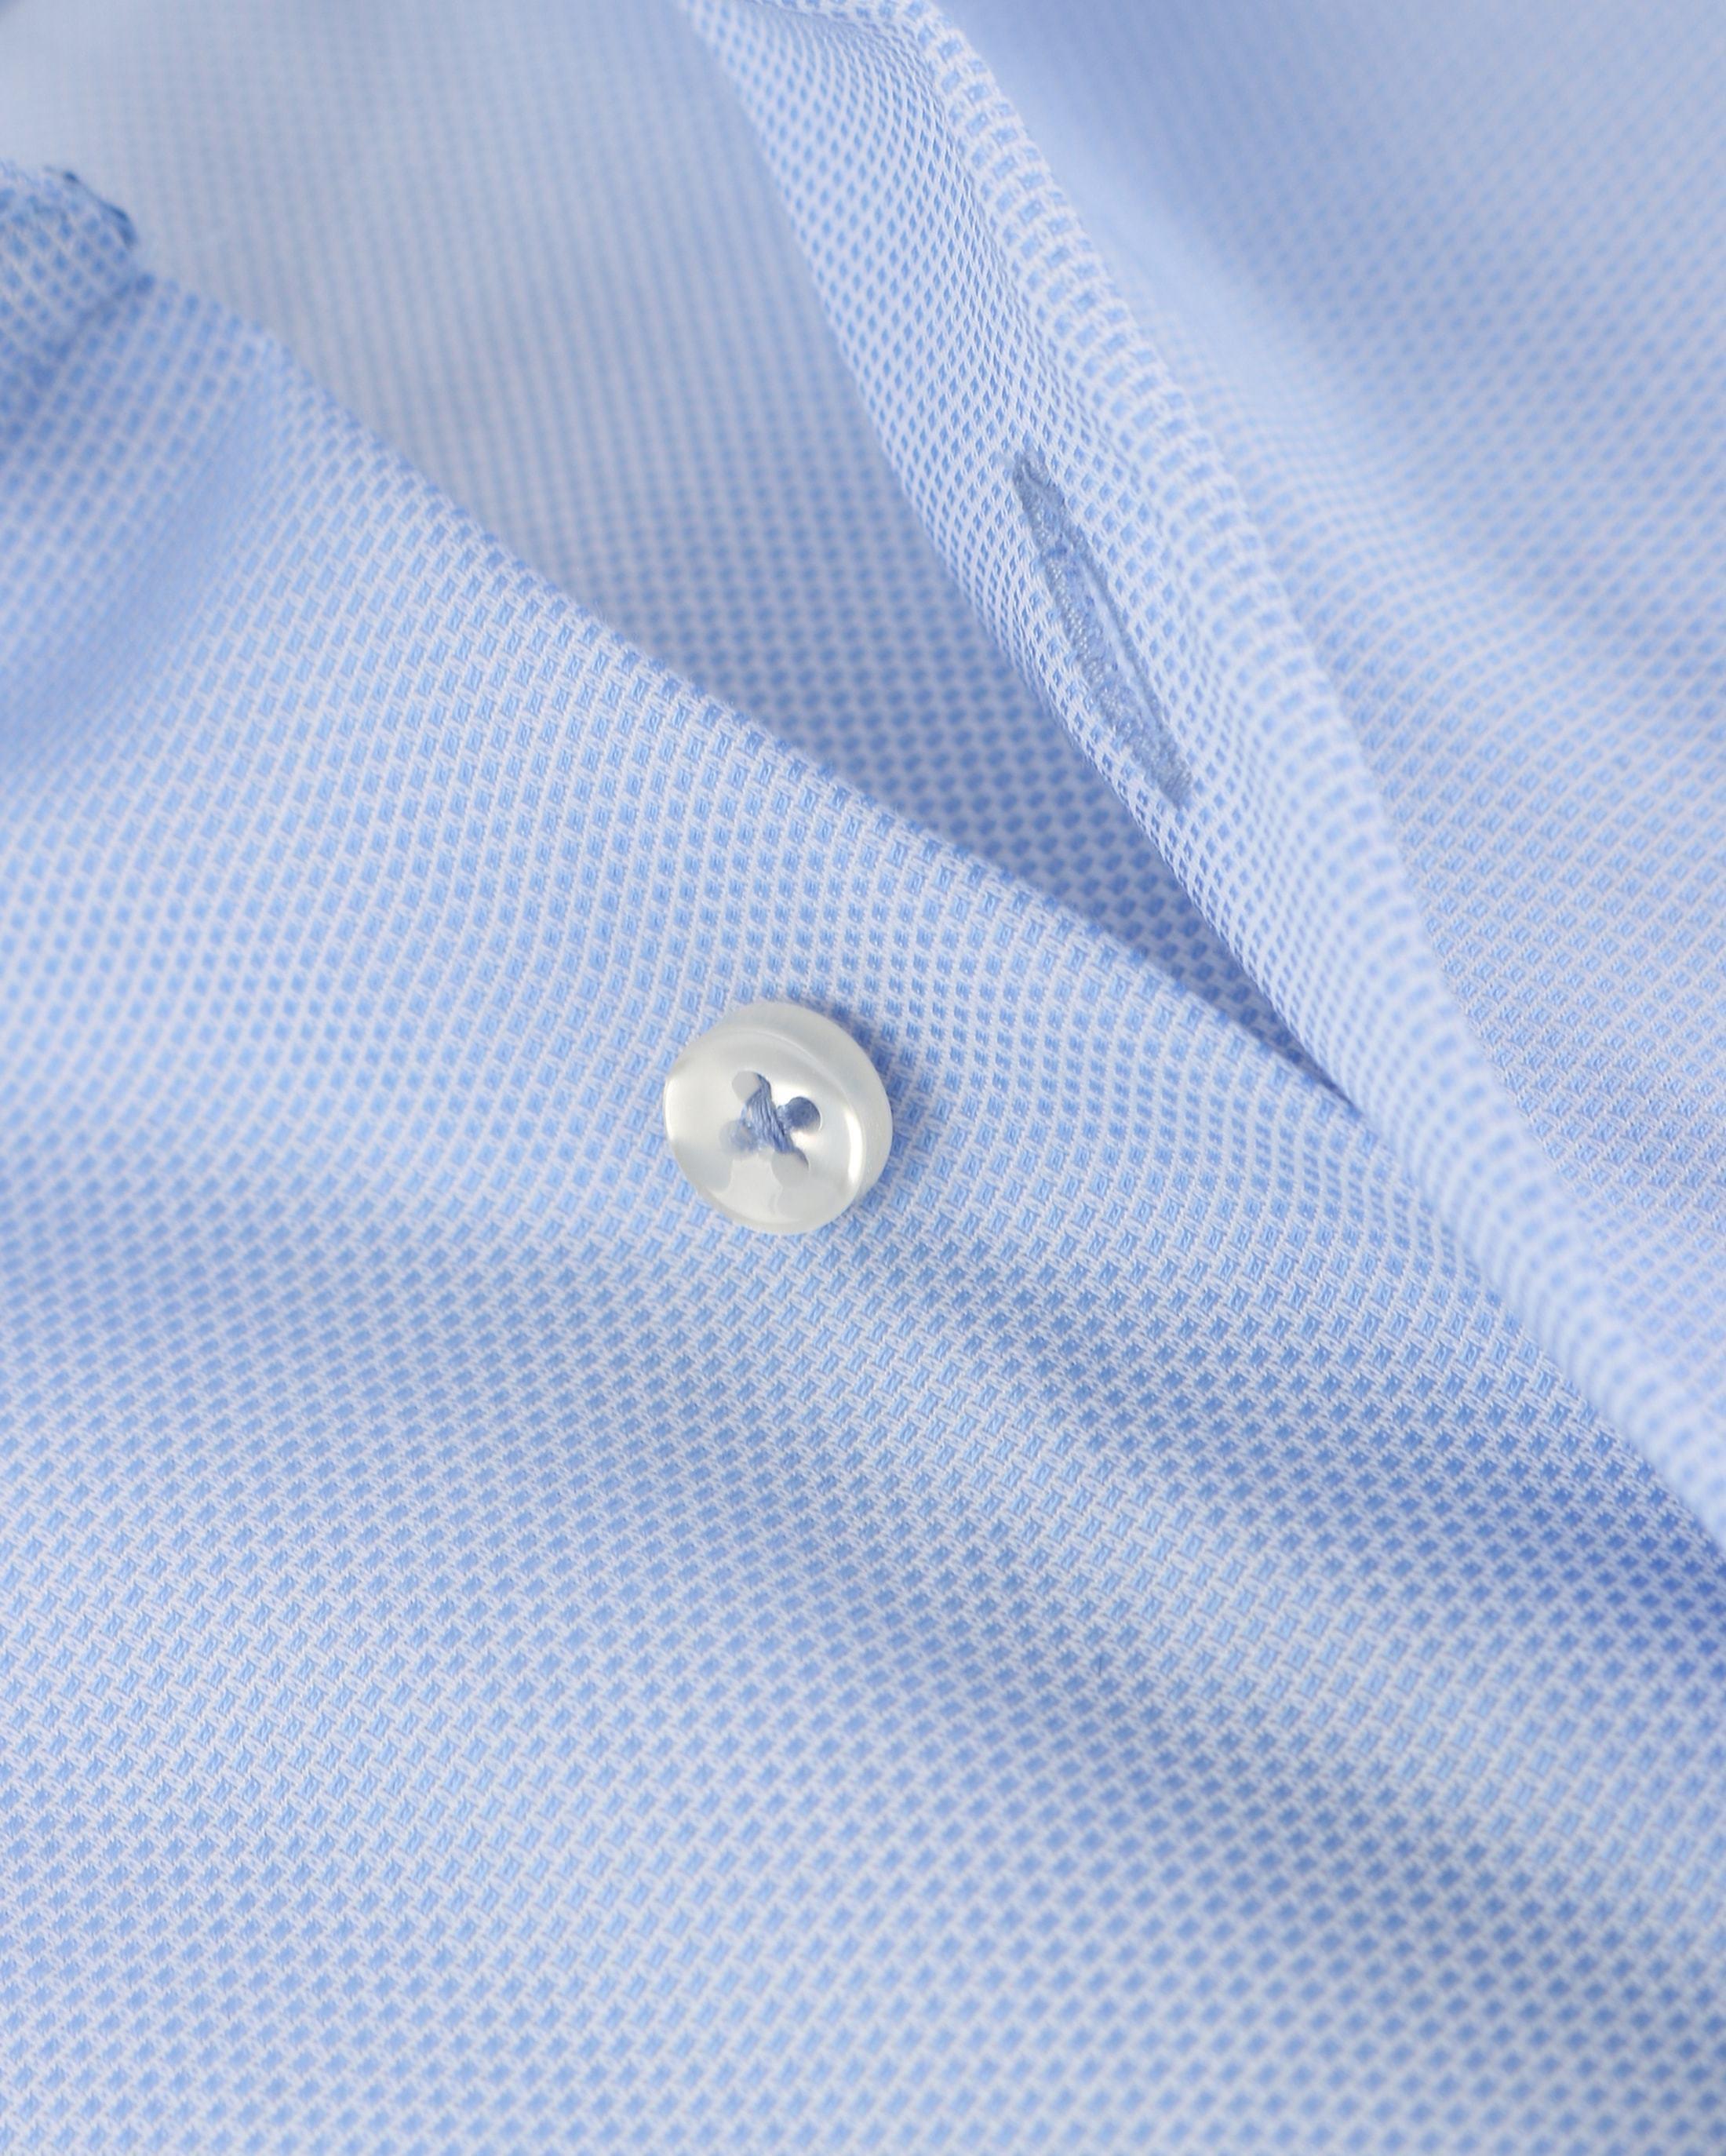 Mouwlengte 7 Overhemd Blauw 150-4 foto 3